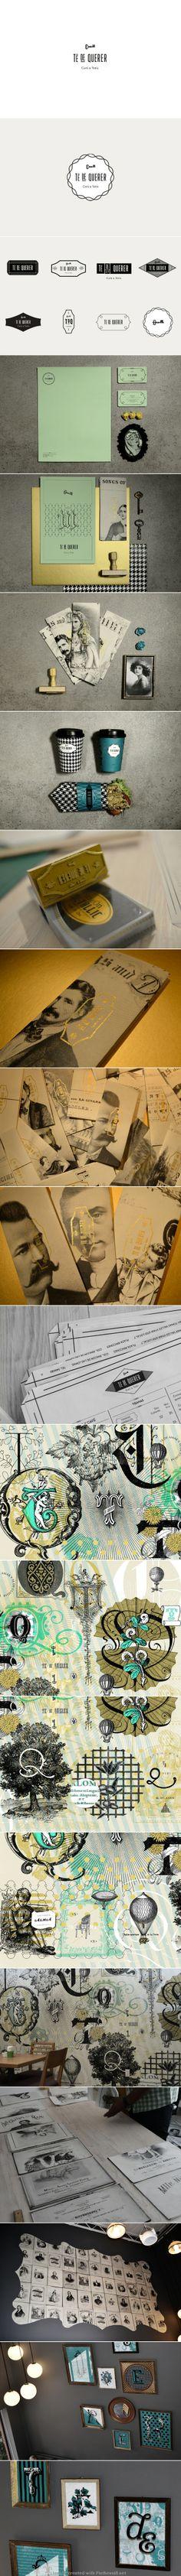 Corporate design logo brochure stamp business letterhead letter vintage packaging